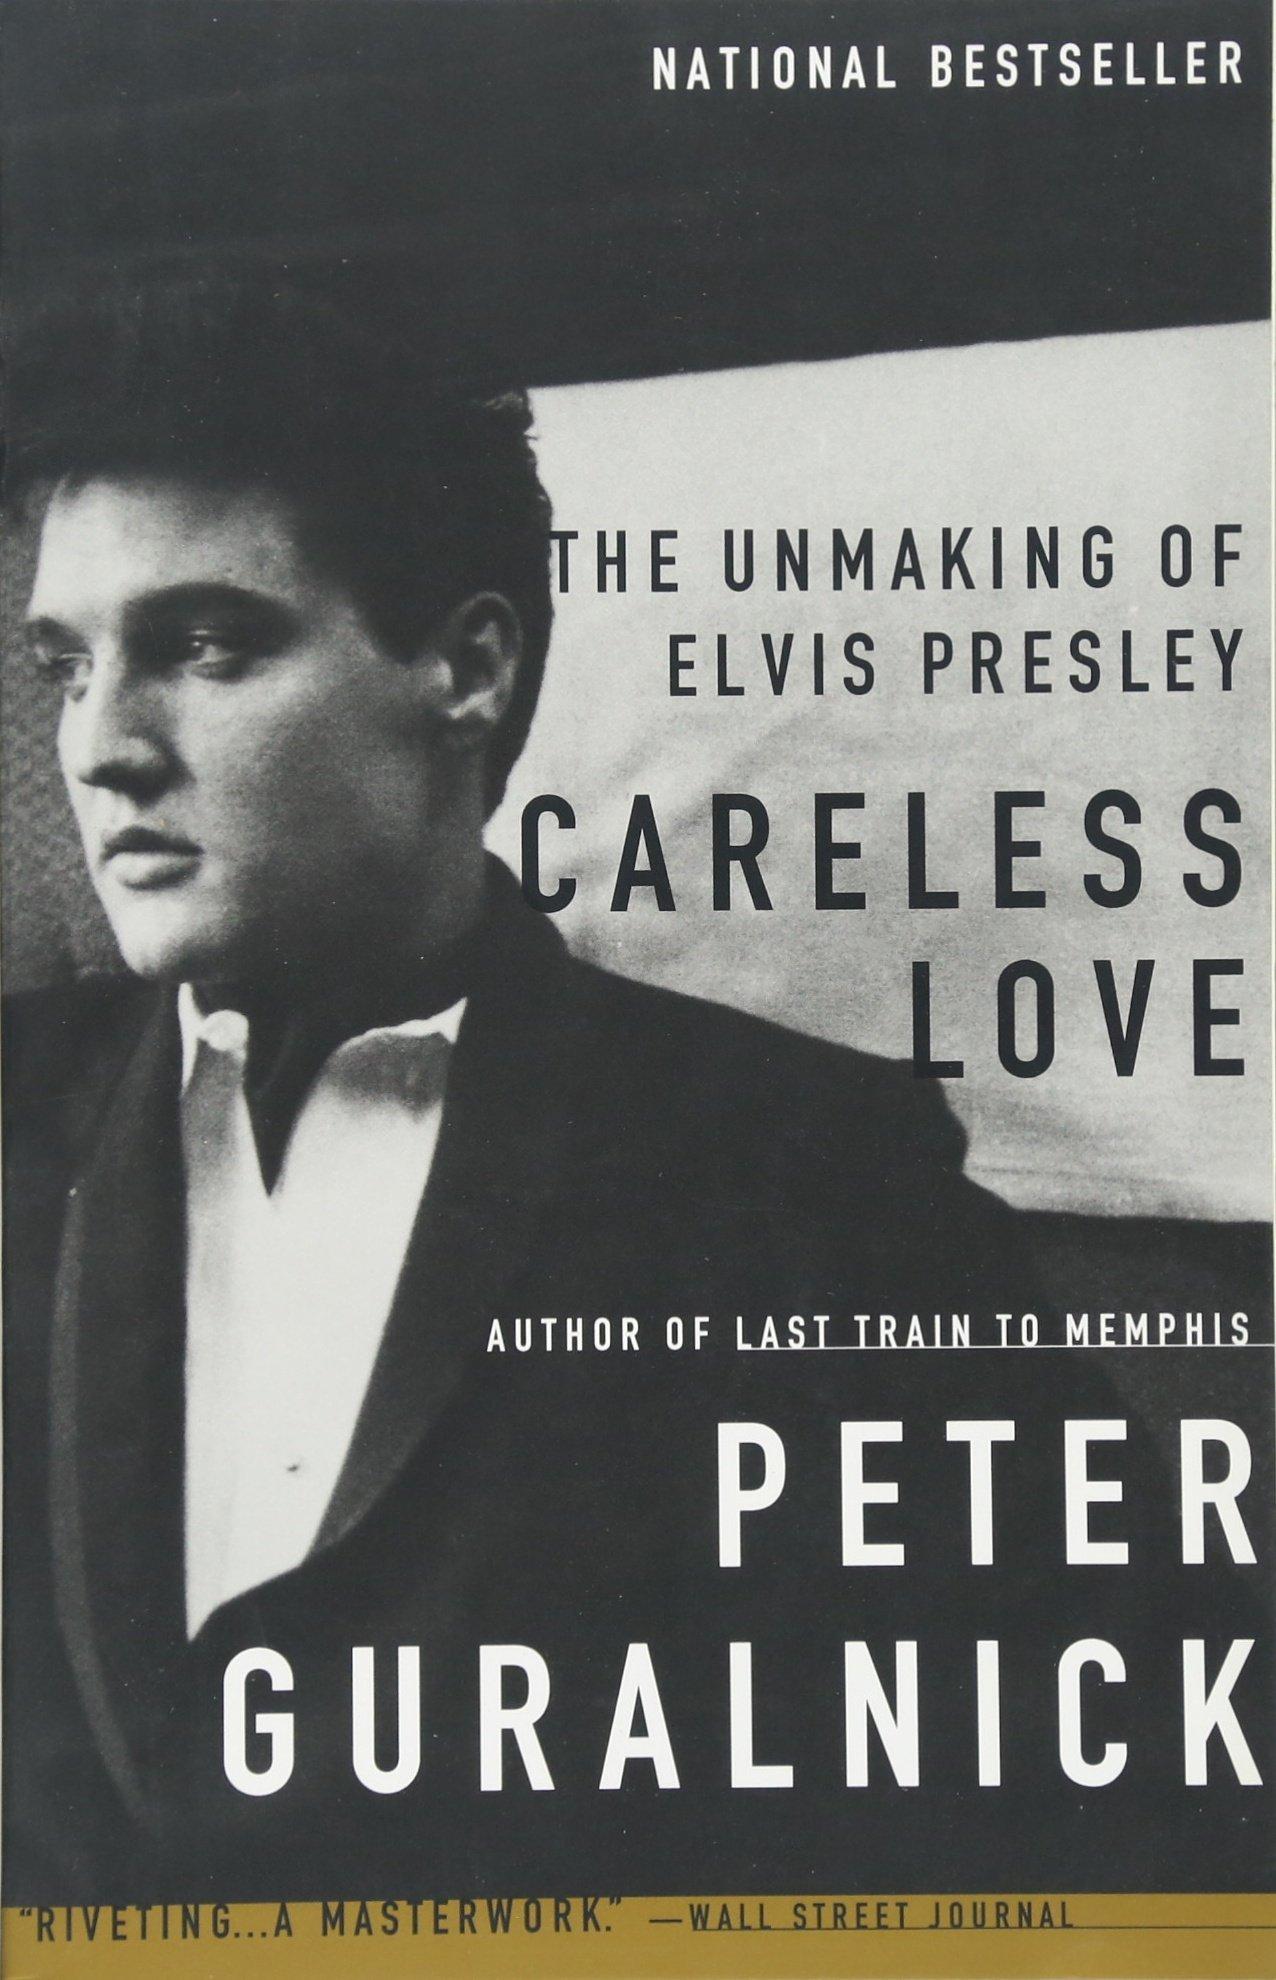 Careless love the unmaking of elvis presley peter guralnick careless love the unmaking of elvis presley peter guralnick 8601404497162 amazon books fandeluxe Choice Image